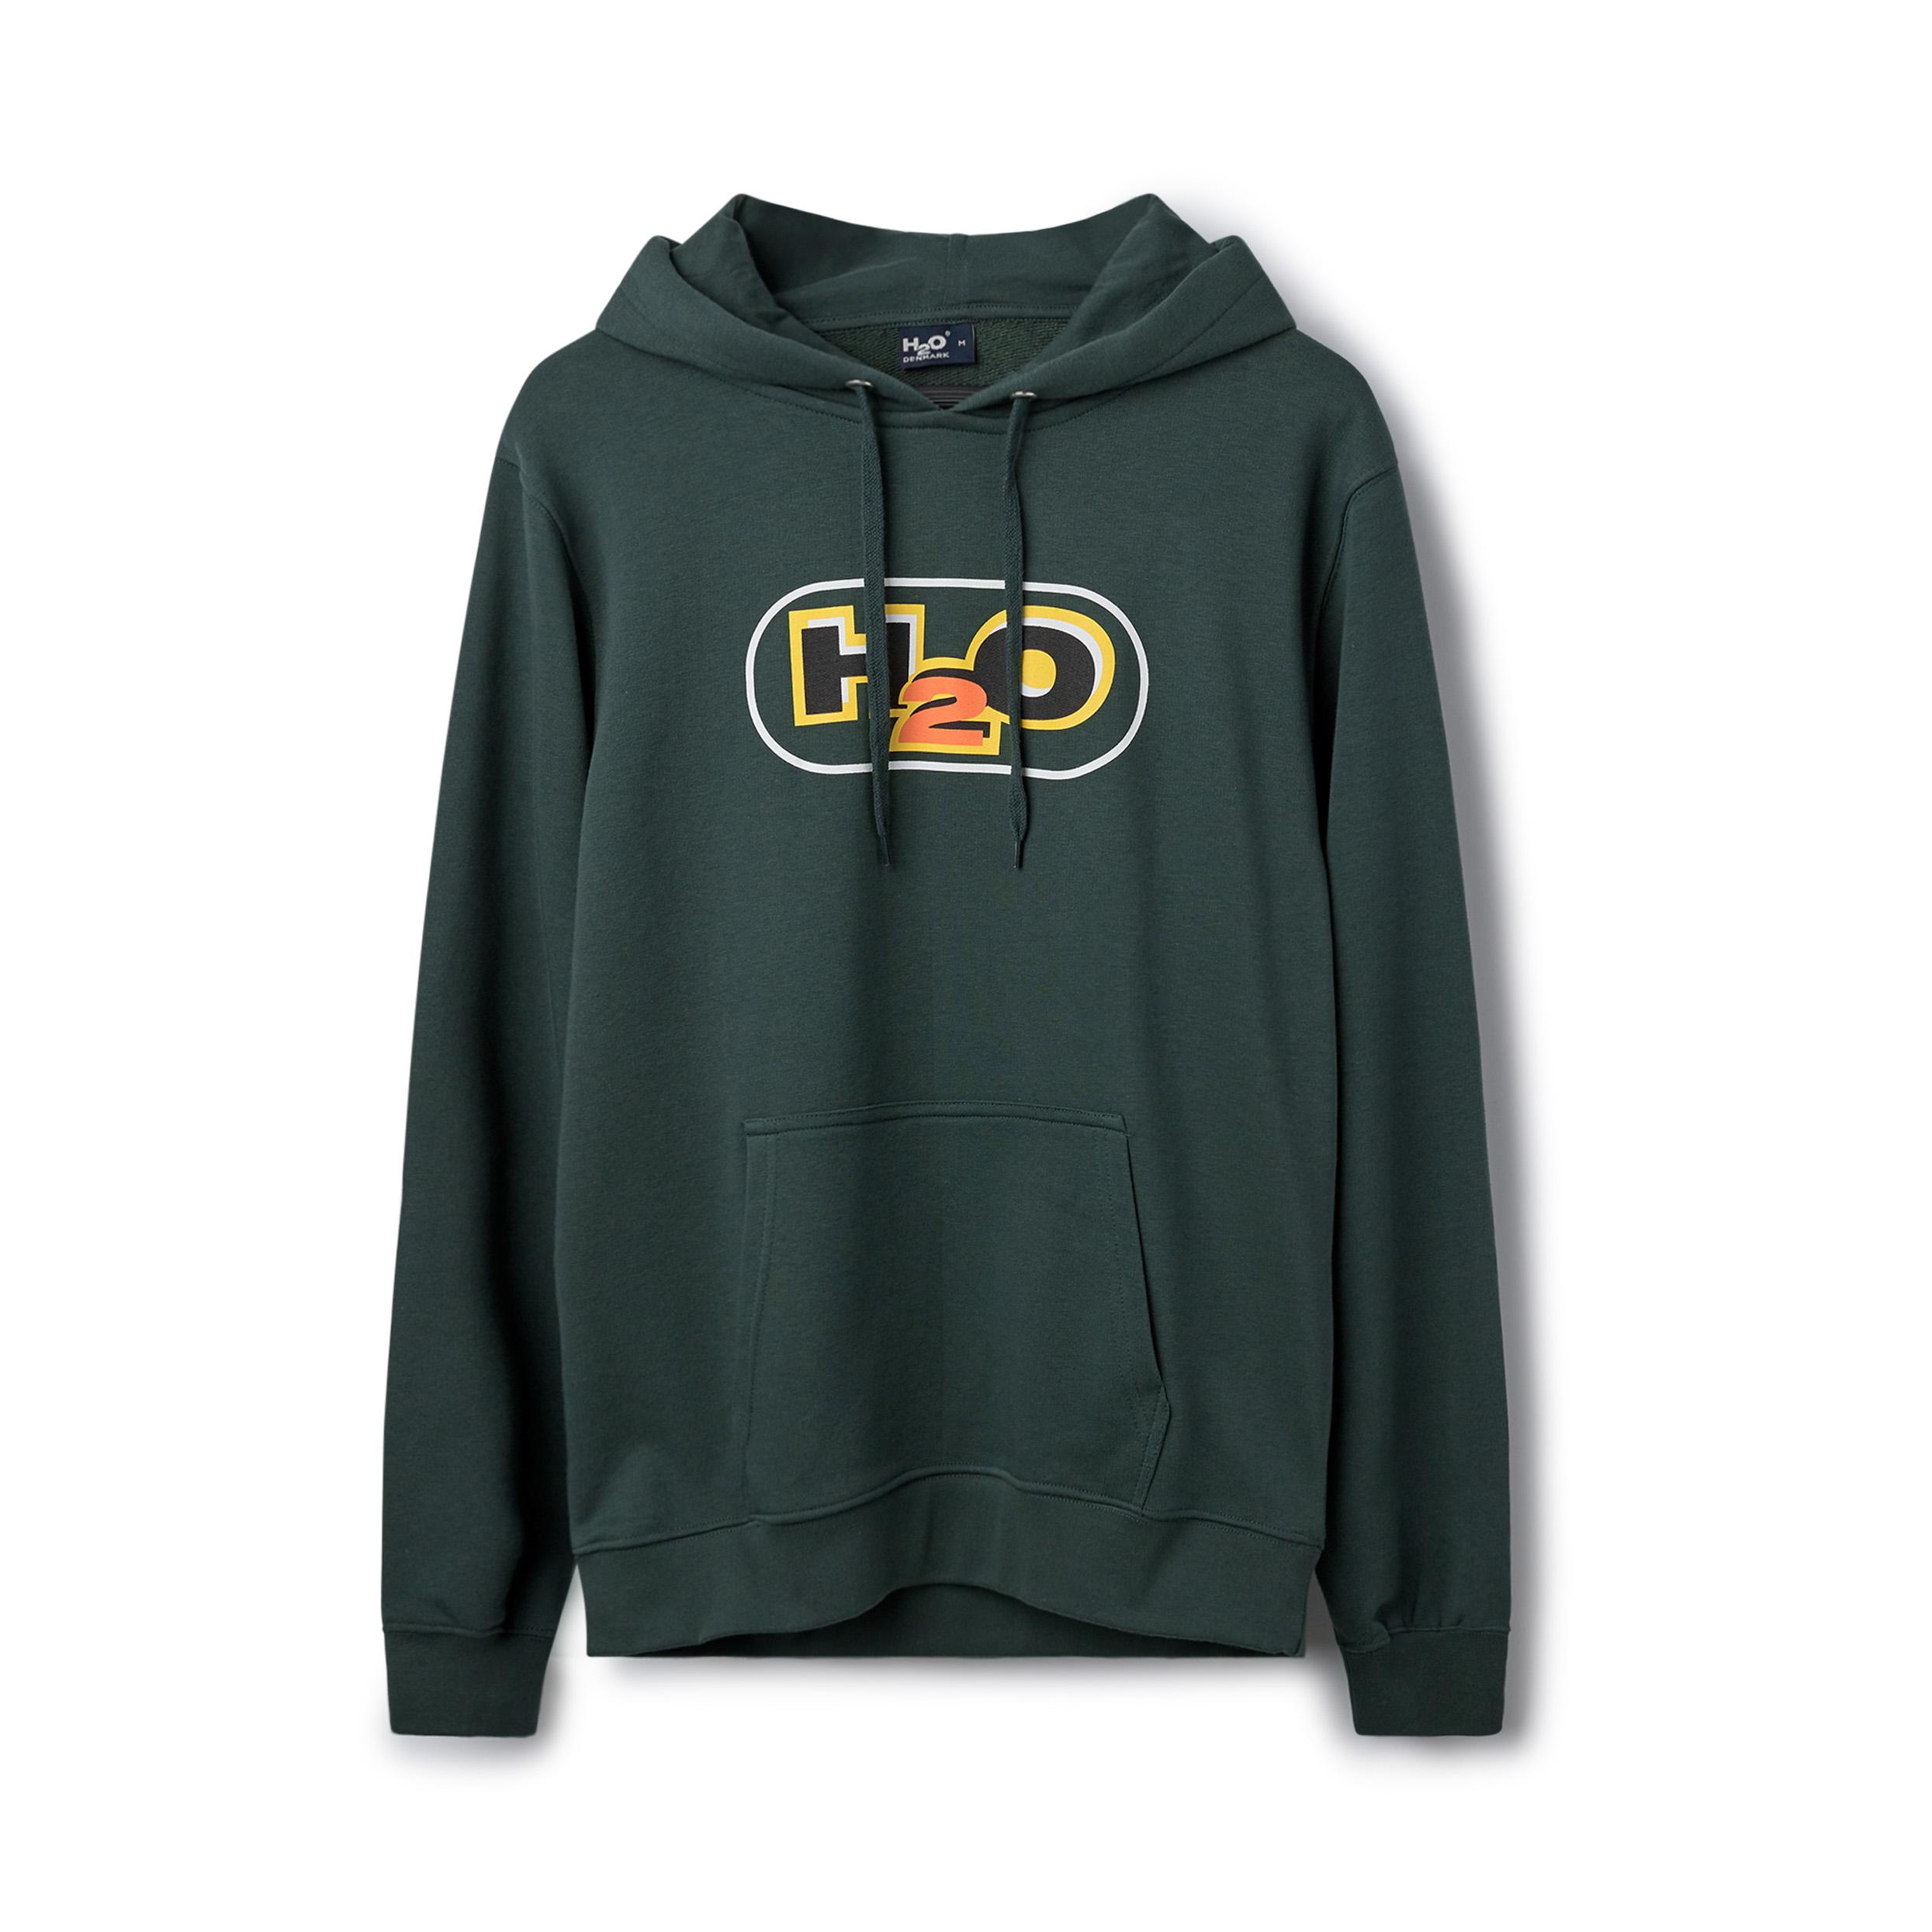 H2O Kilde hoodie